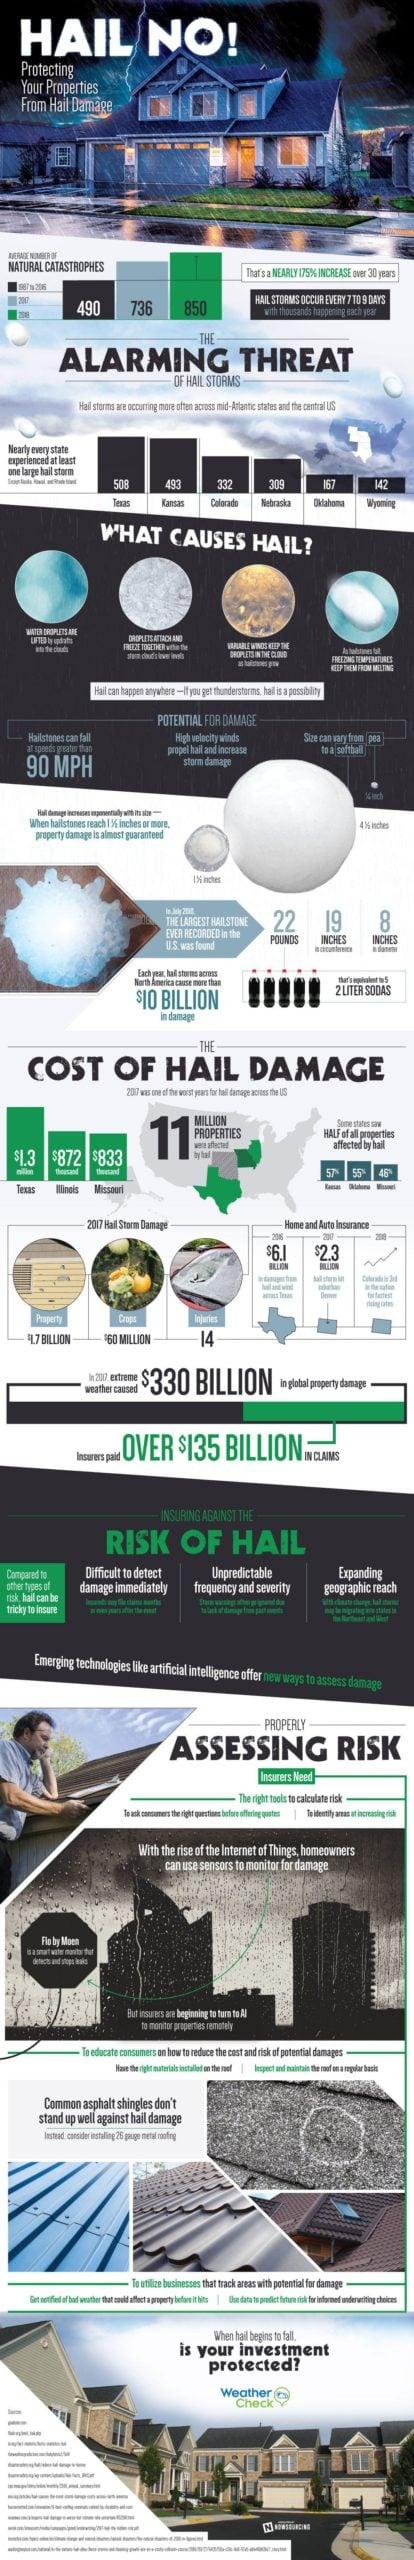 Hail Damage Infographic